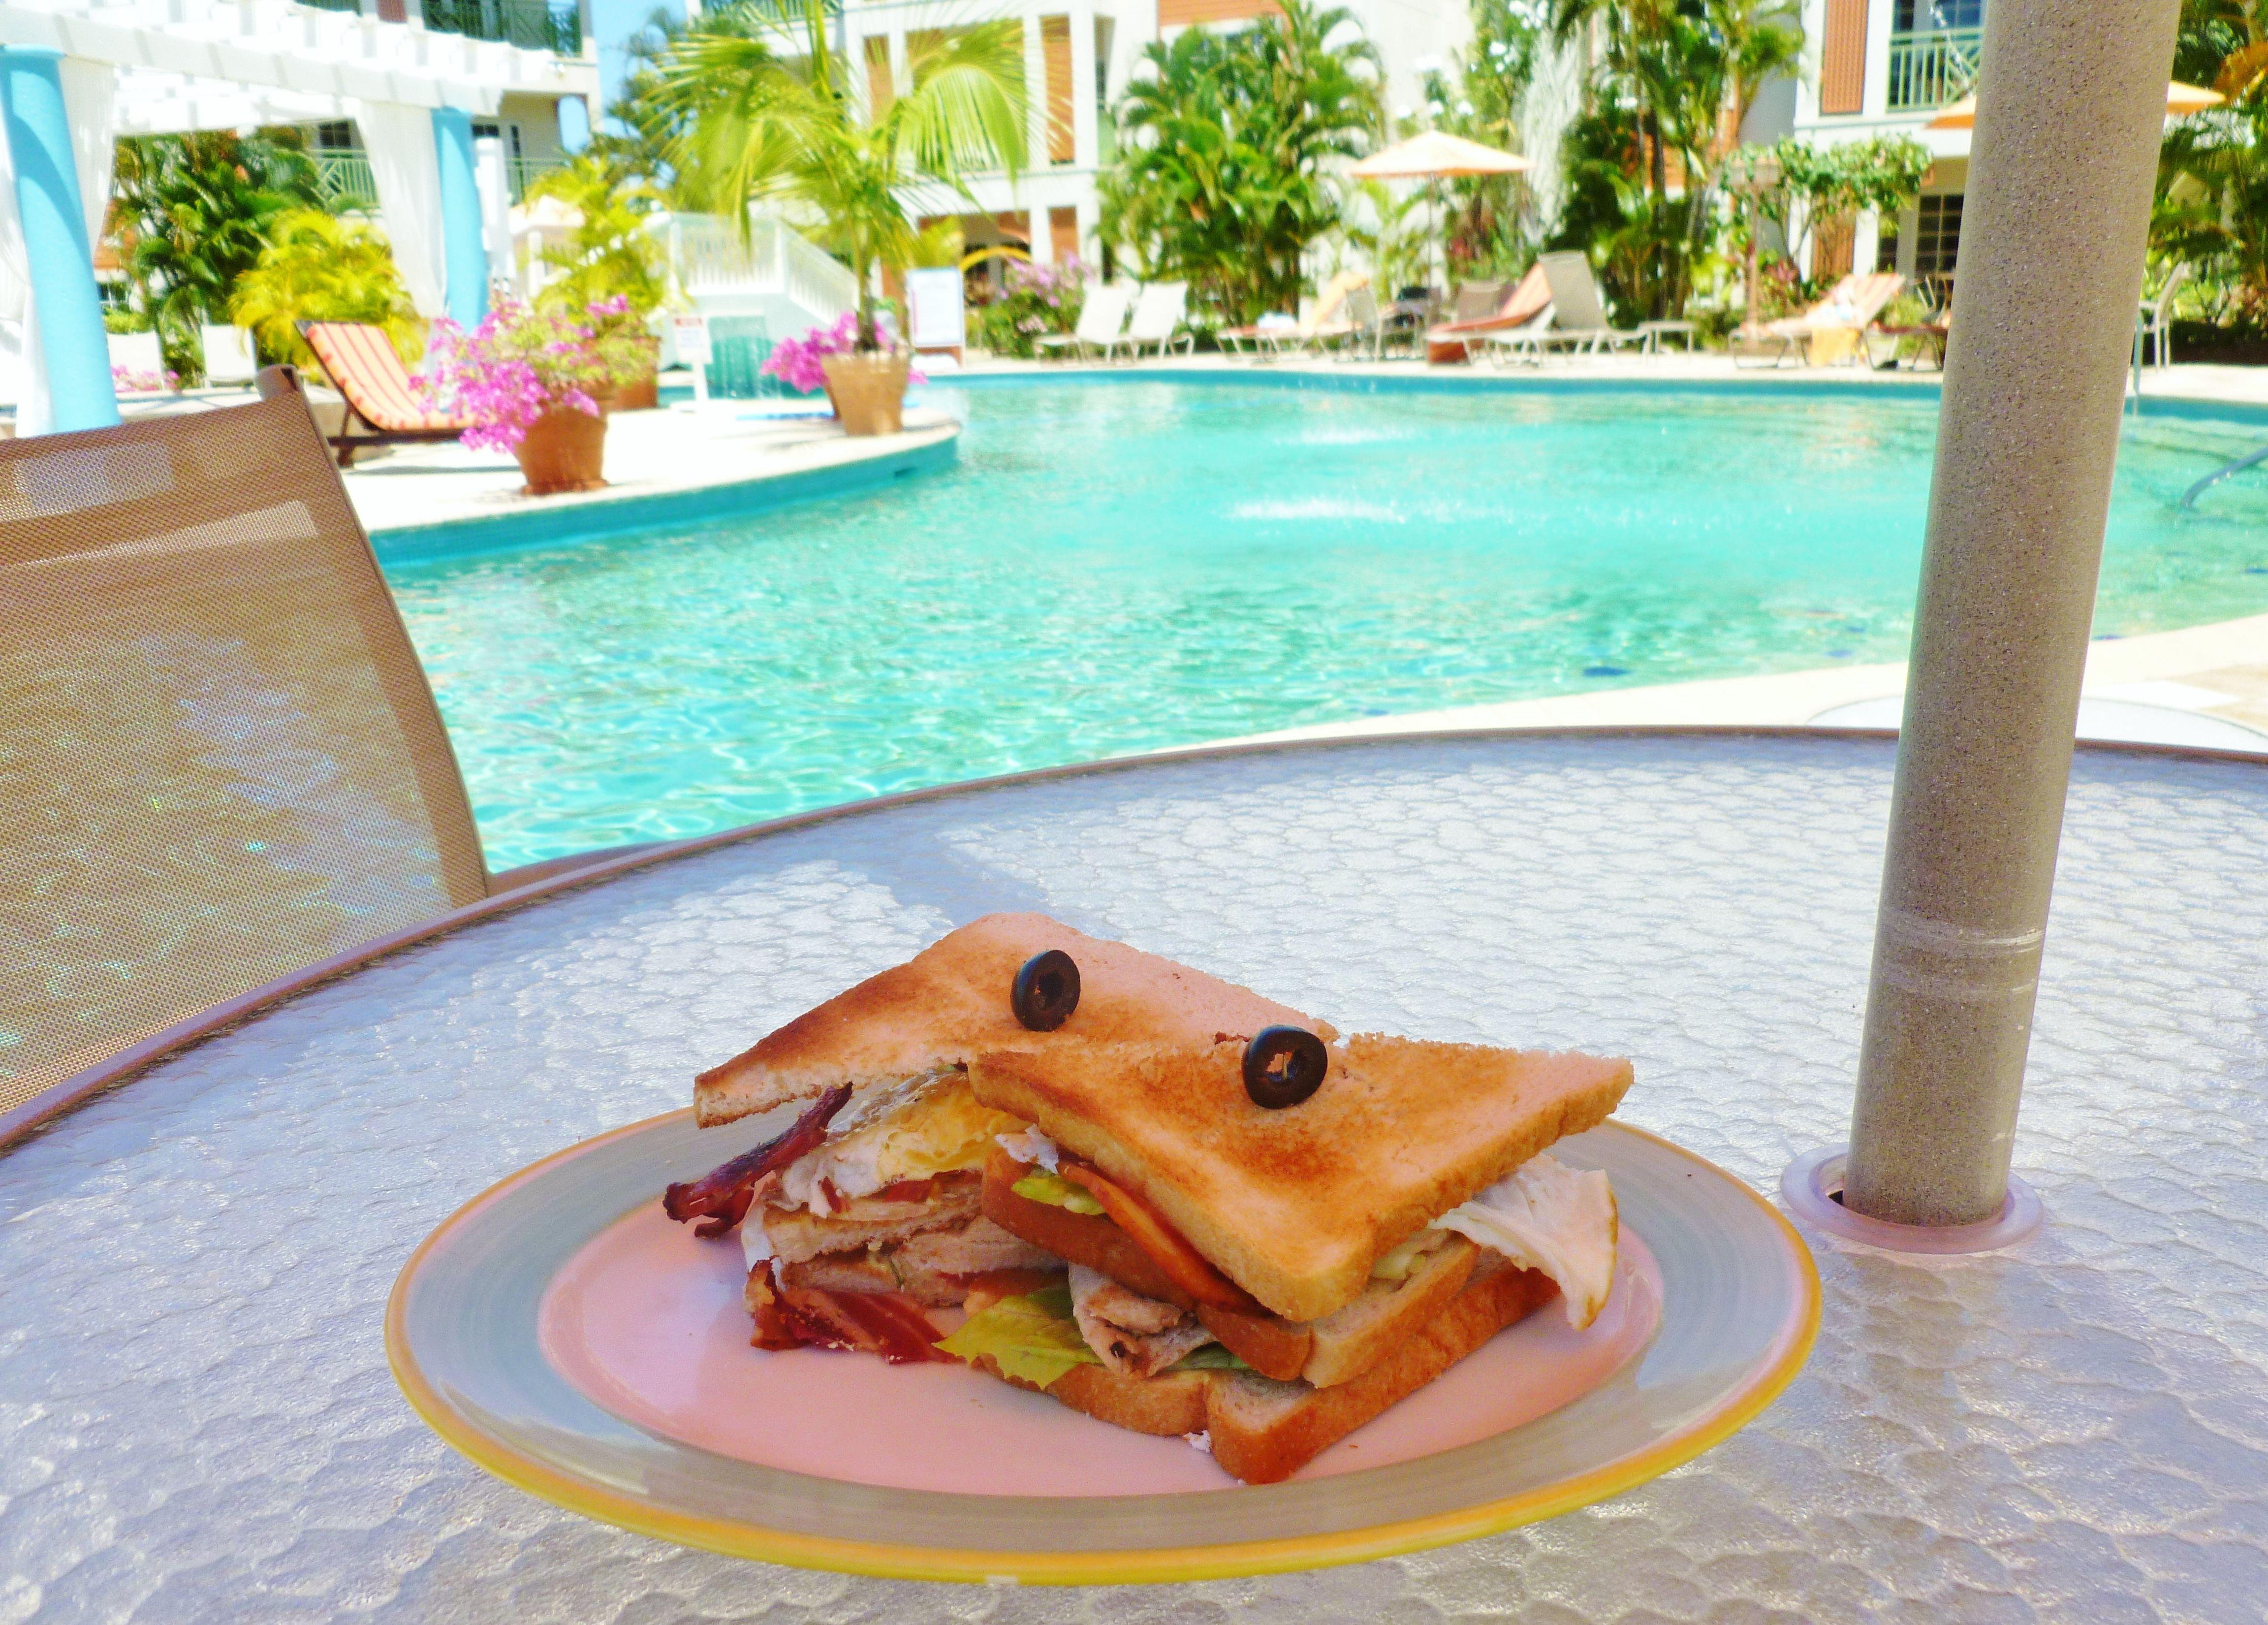 17f7aecec6cb4650d37e84ccdf16ff87 - Bay Gardens Beach Resort St Lucia Caribbean